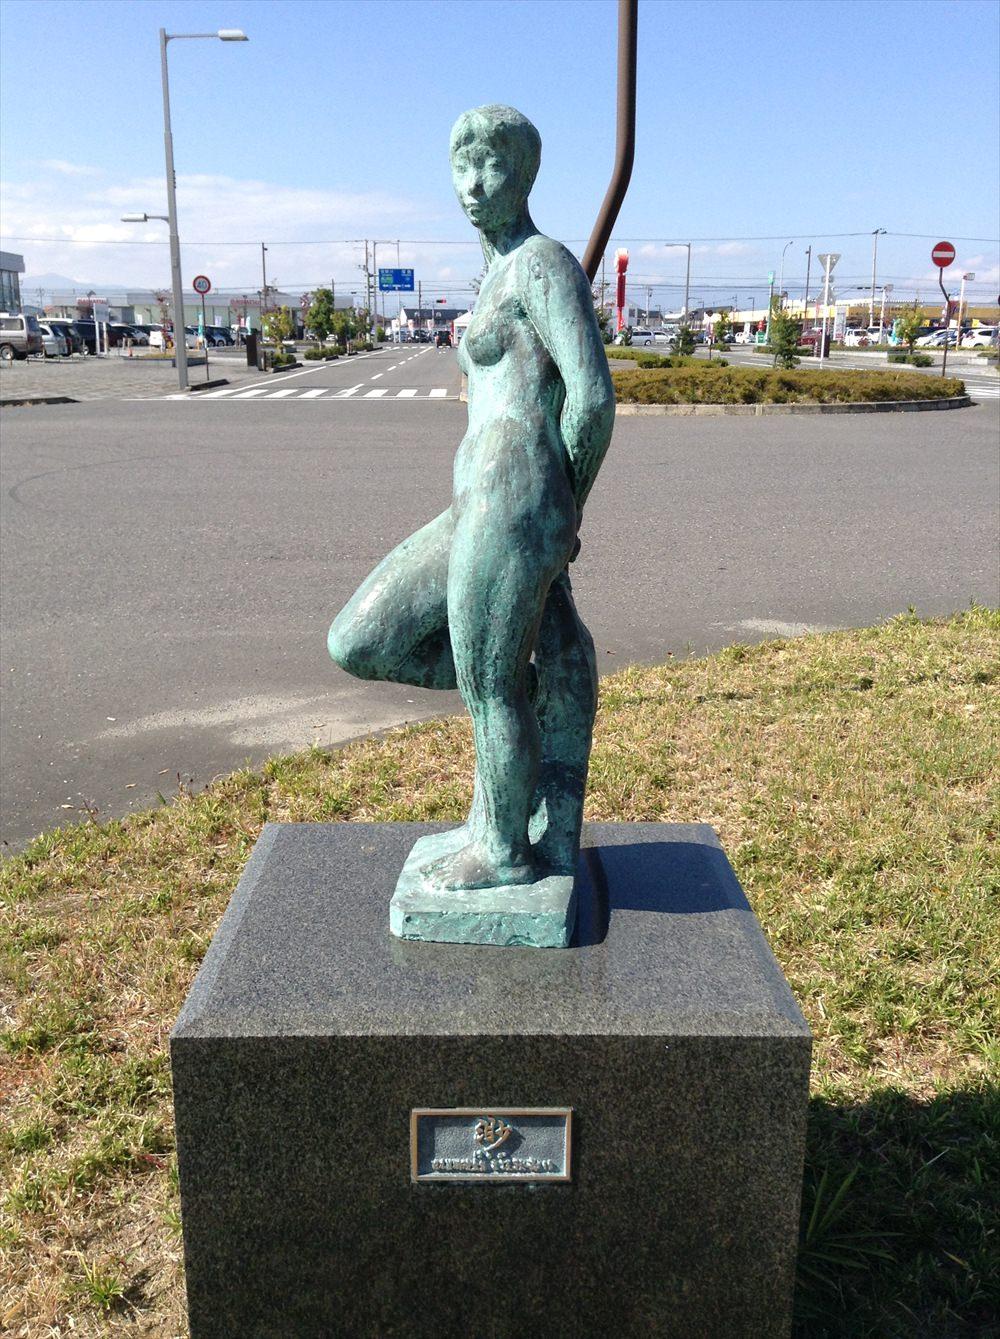 http://at-art.jp/wp-content/uploads/2015/12/R_koriyama_haruka_1.jpg